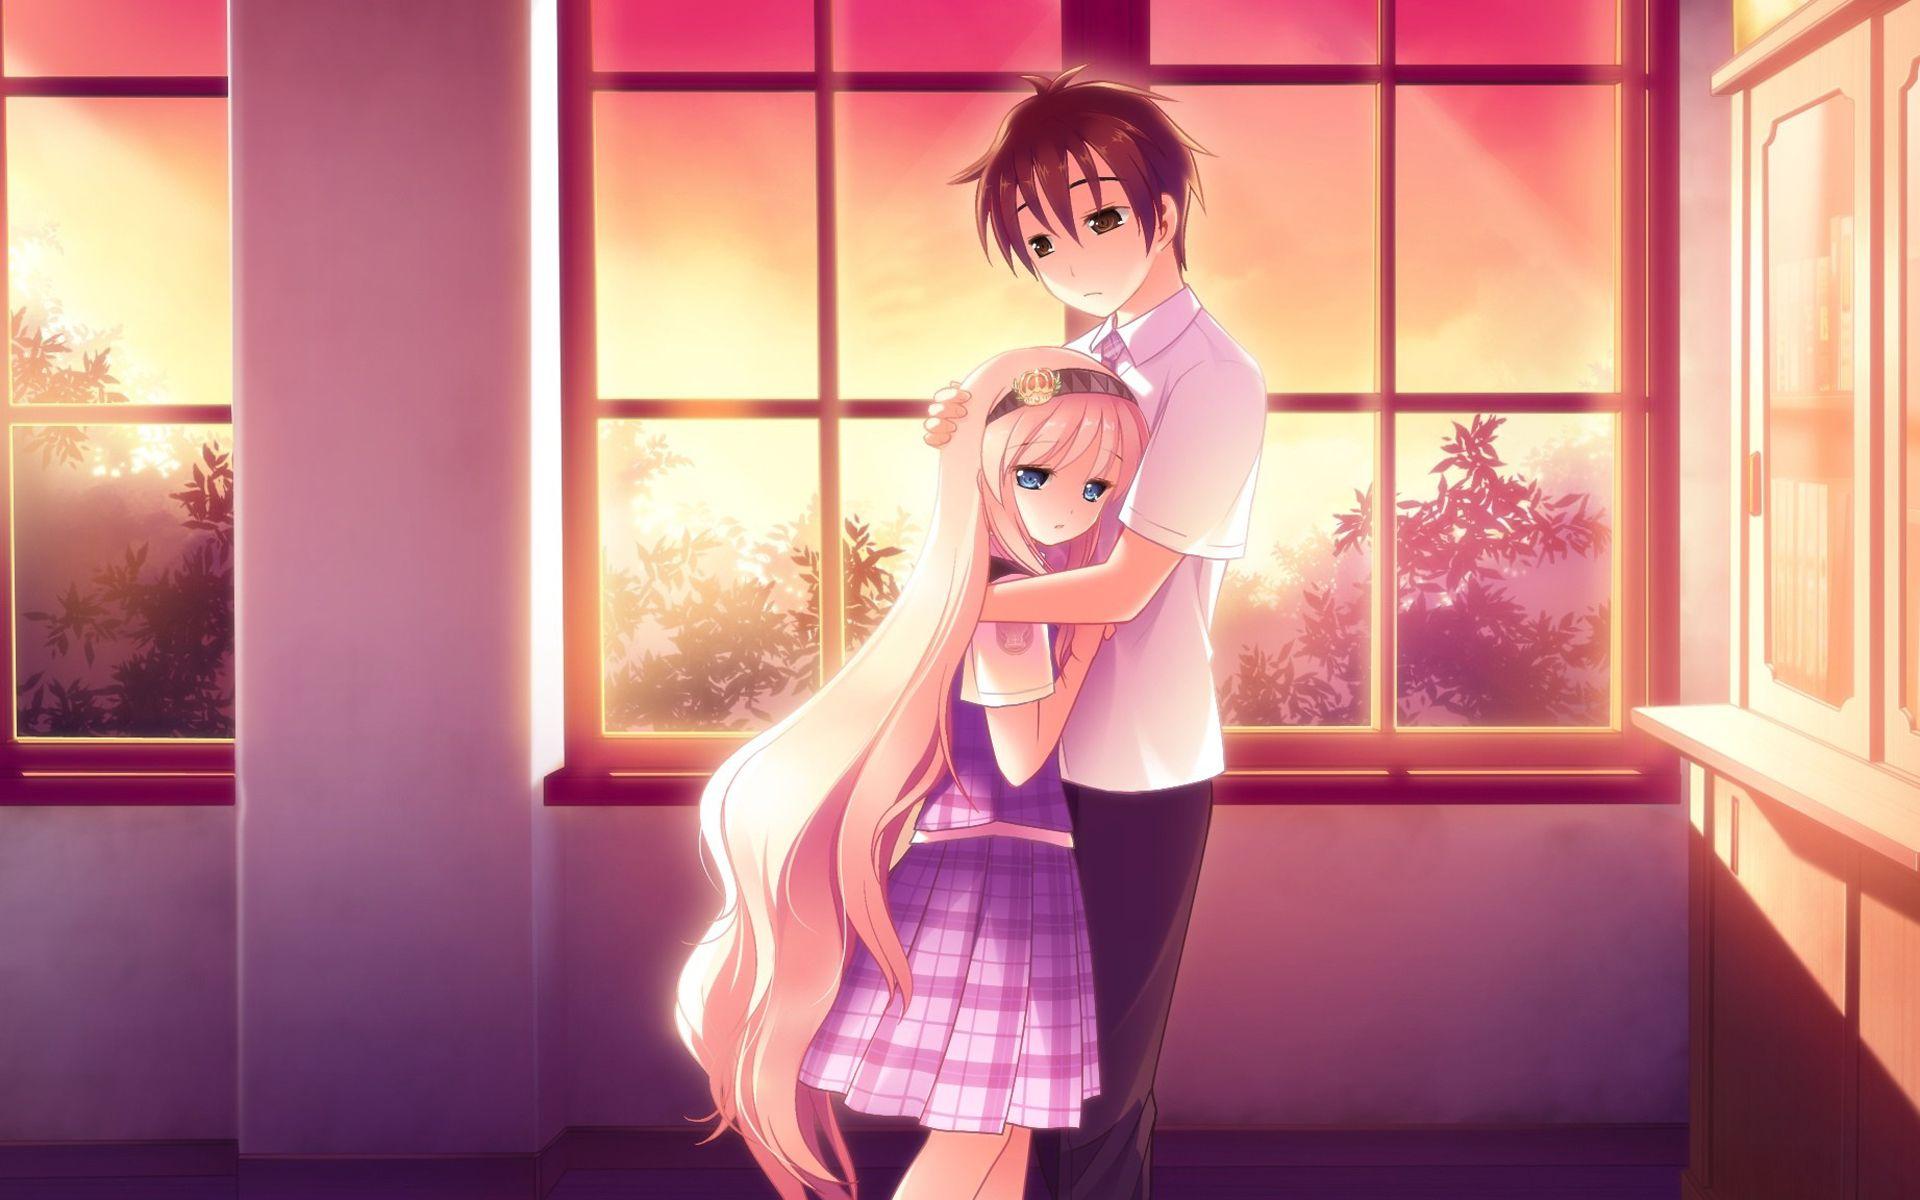 Pin De Kevin Larsen En Rrejopher Besos Tiernas Anime cute wallpaper love